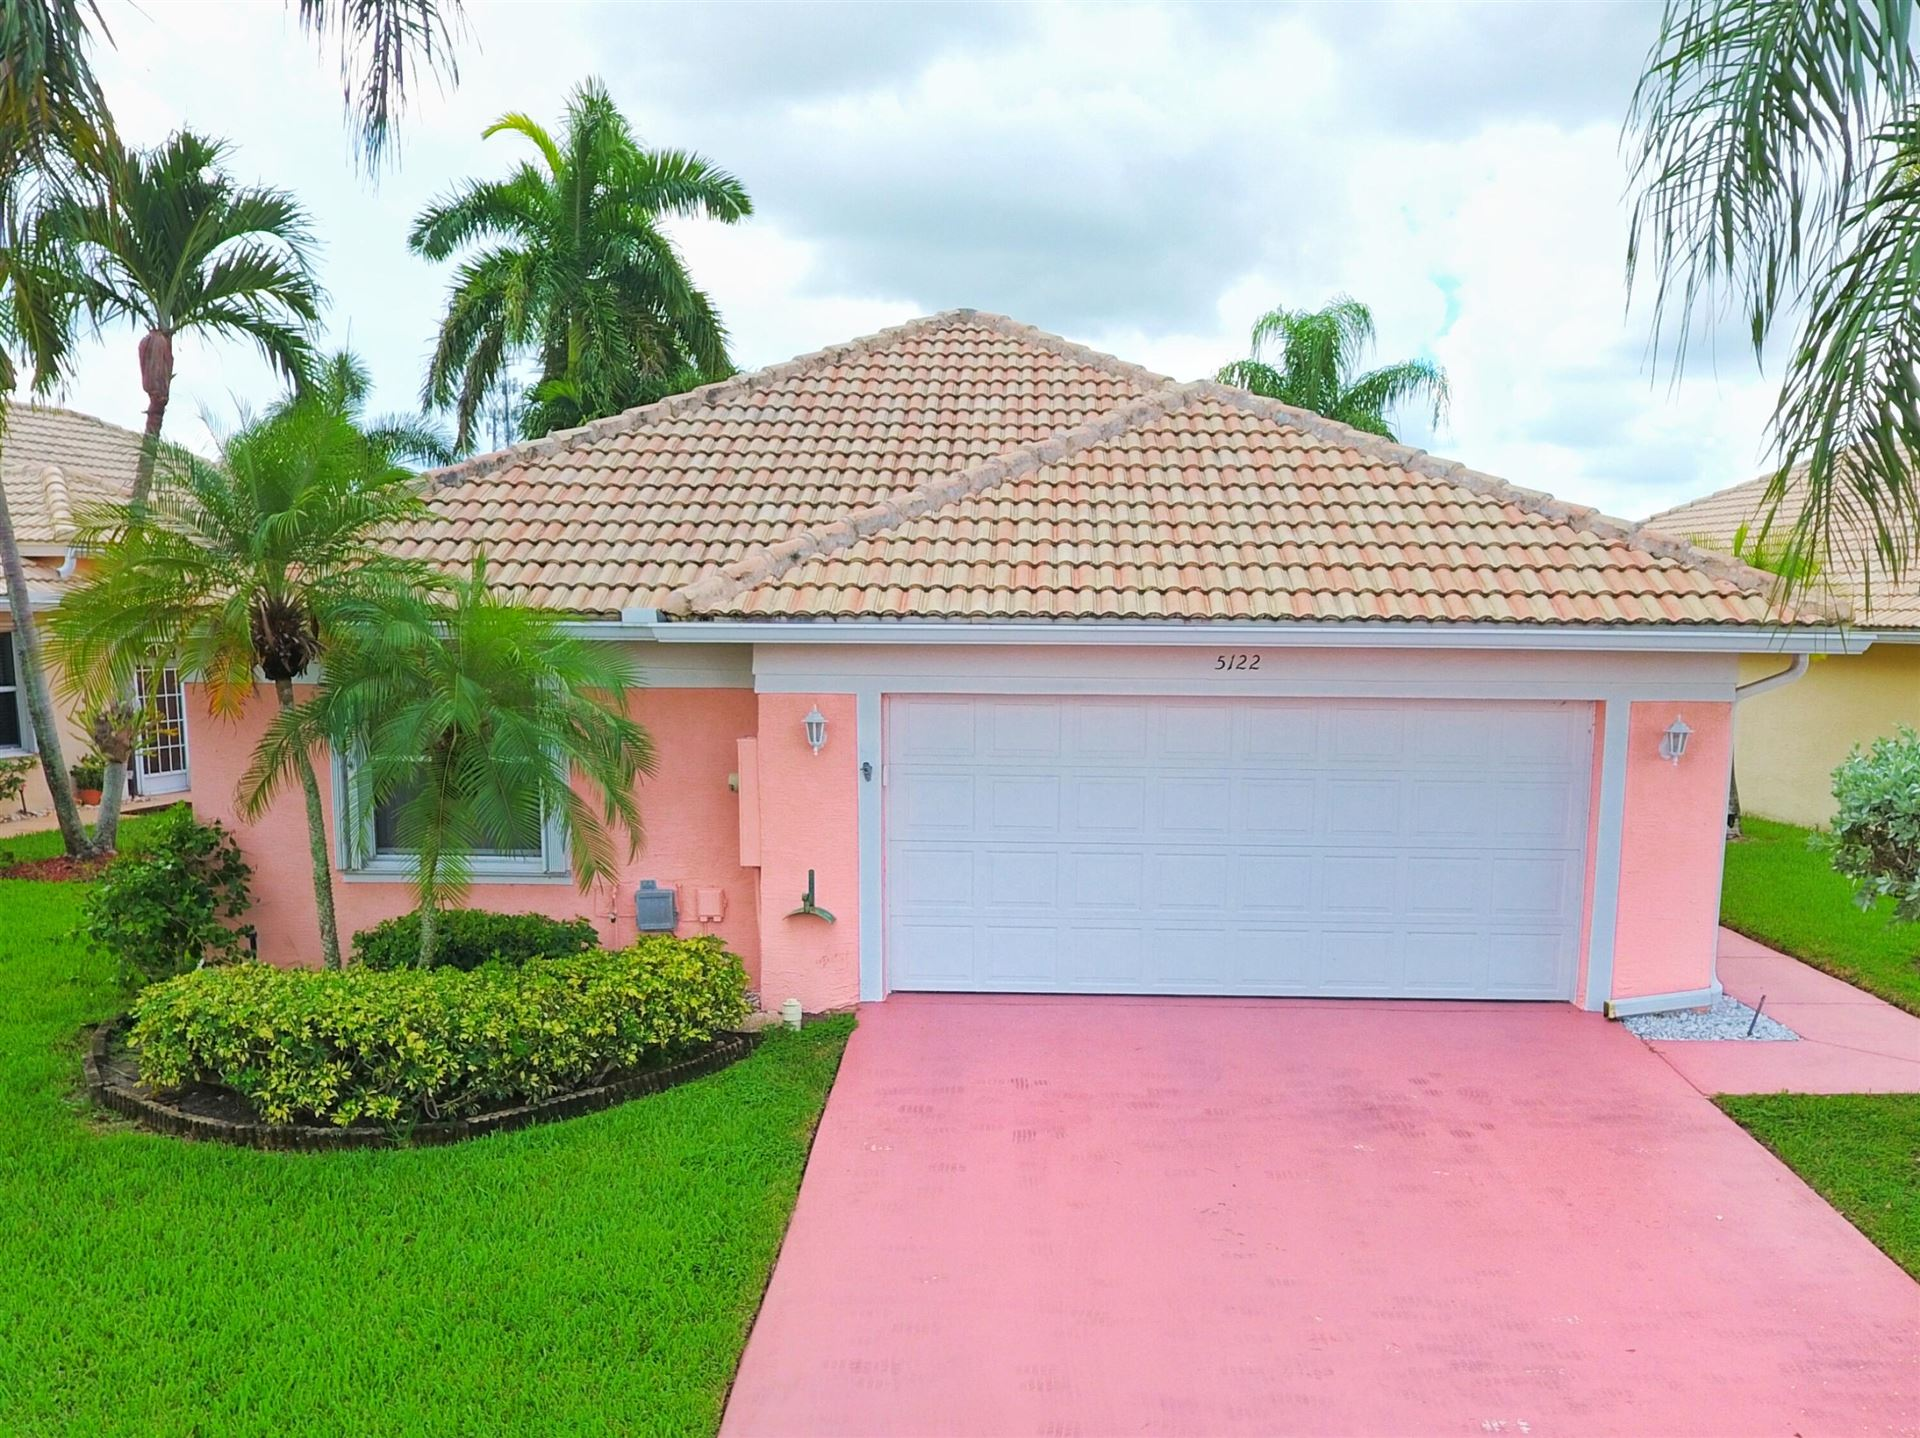 5122 Marla Drive, Boynton Beach, FL 33436 - MLS#: RX-10747801